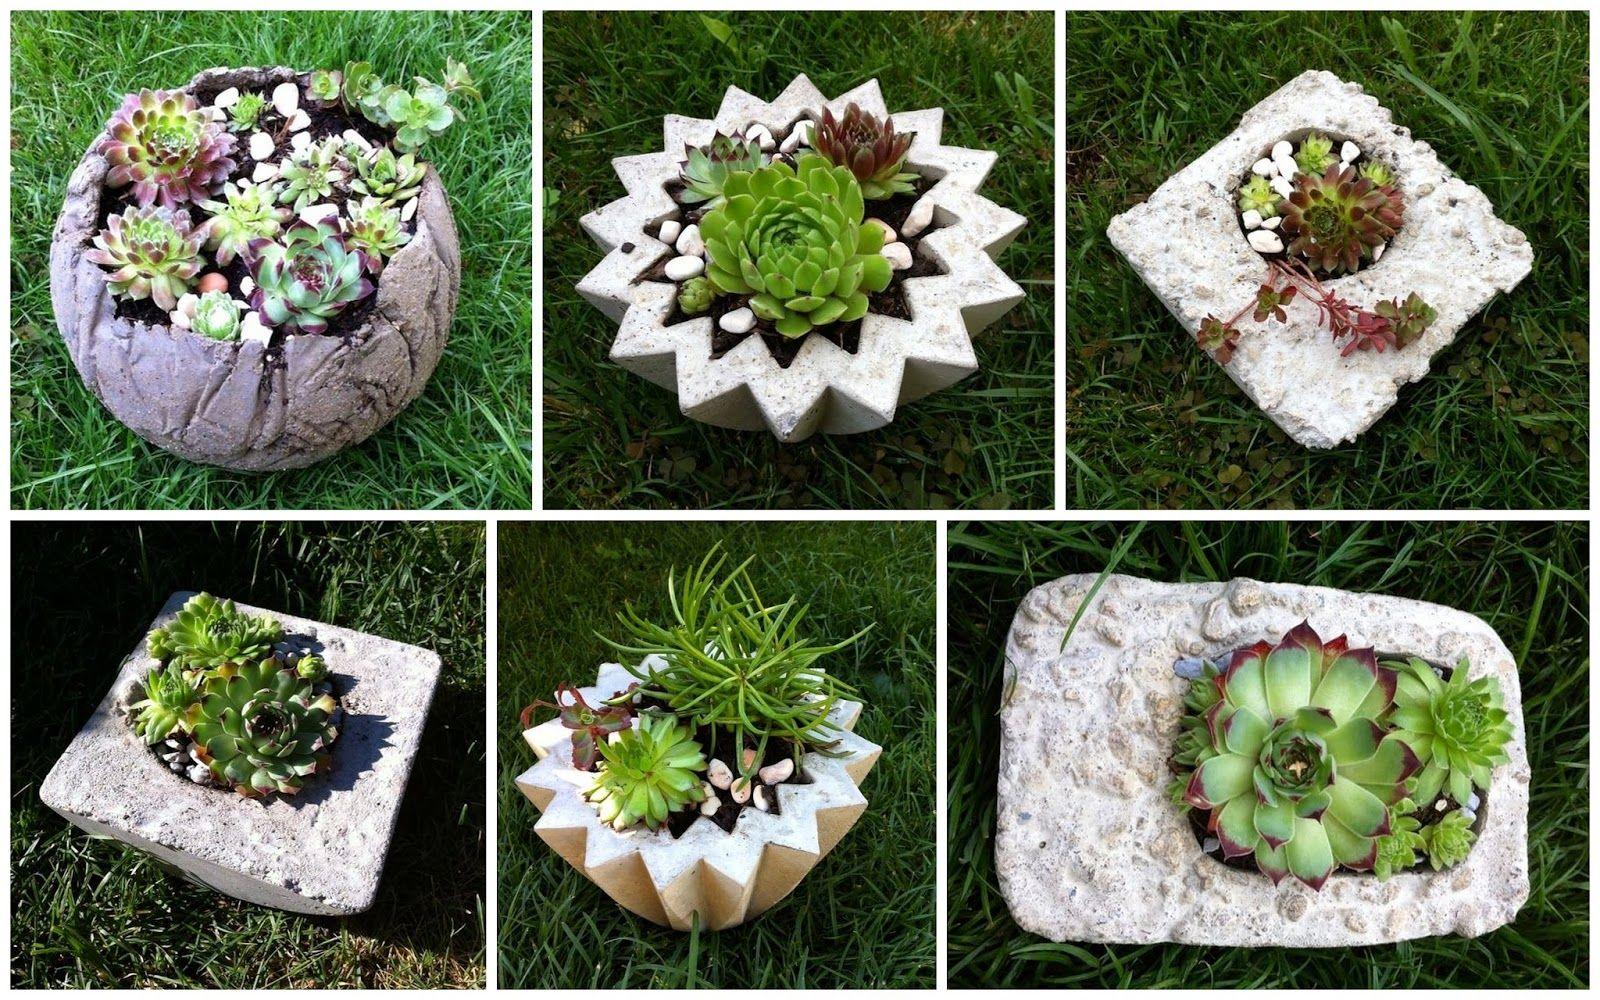 Ausgefallene Gartendeko Selber Machen Genial Kreative Mitbringsel Aus Beton